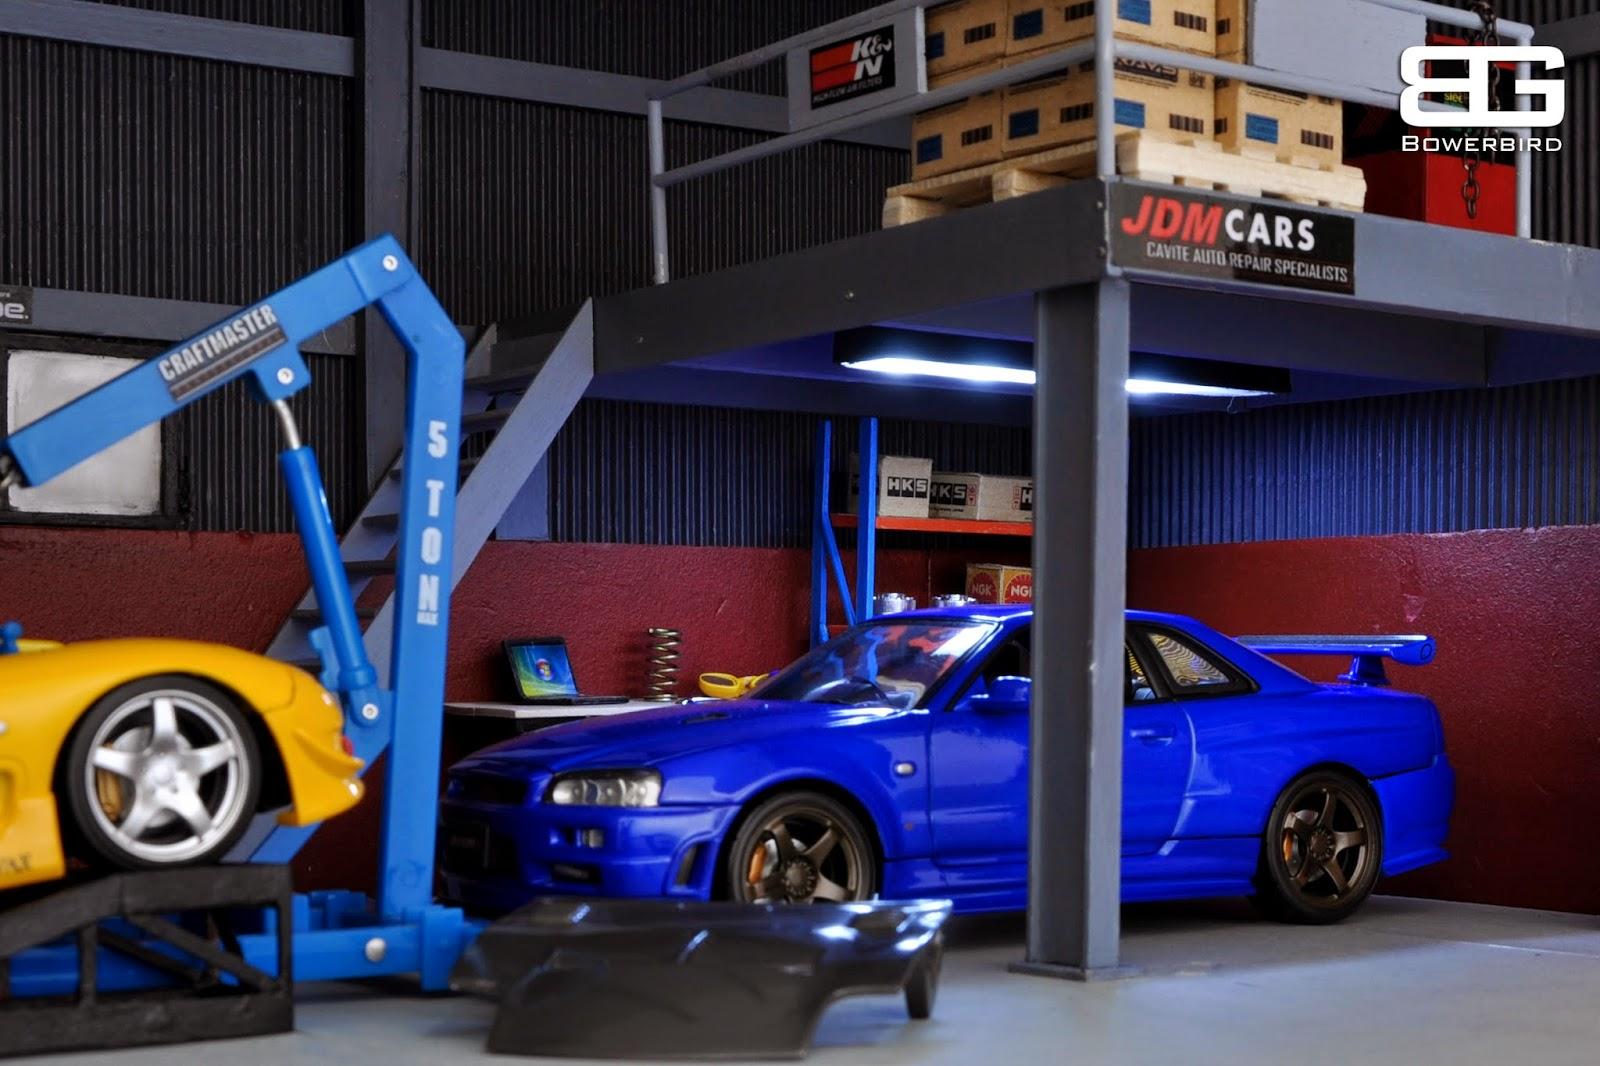 Bowerbird Garage Diorama Bowerbird Garage Jdm Cars